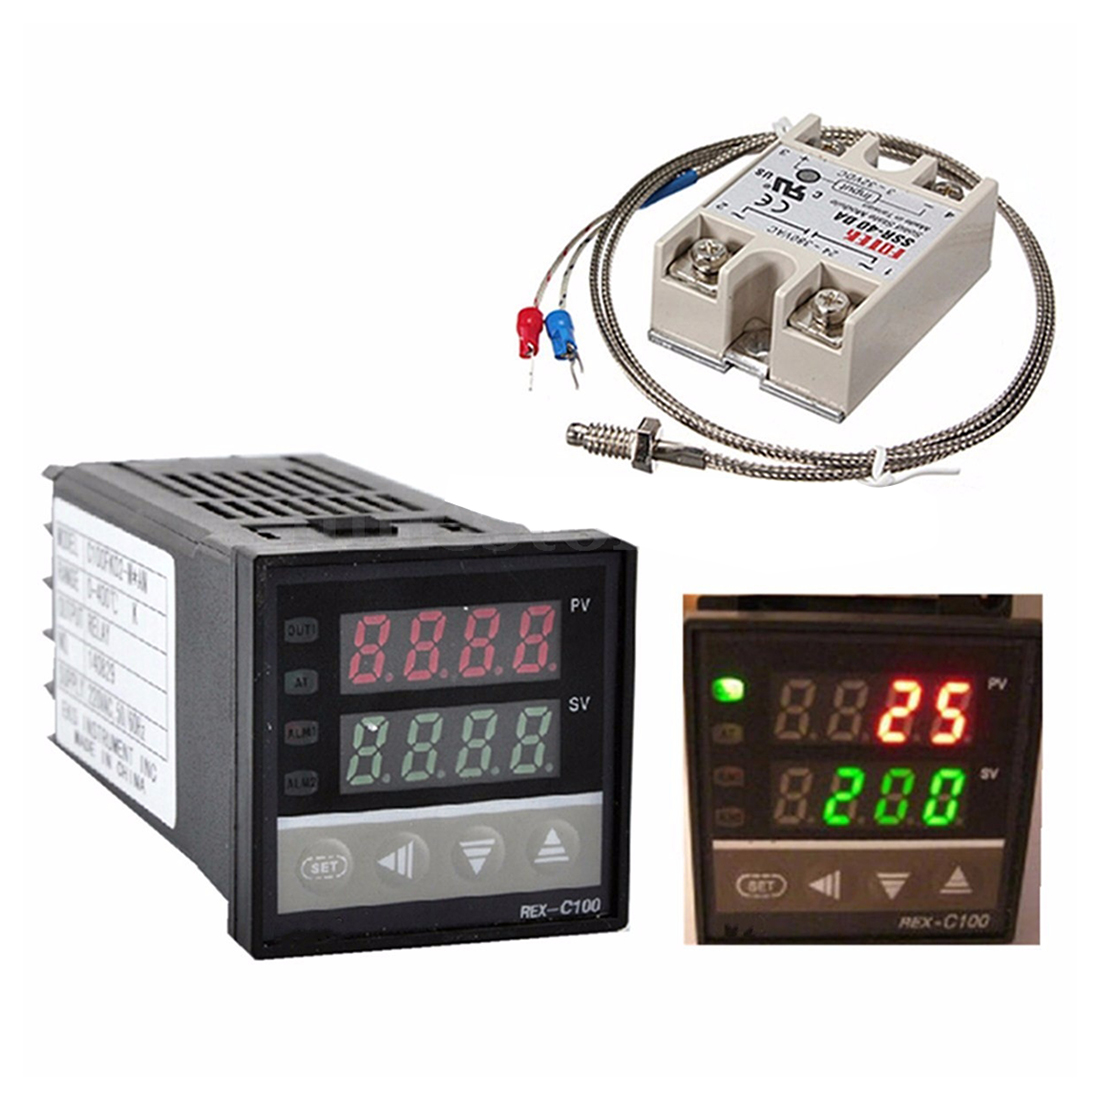 Image 2 - Digital 220V PID REX C100 Temperature Controller + max.40A SSR + K Thermocouple, PID Controller Set + Heat Sinkrex-c100 temperature controllerpid rex-c100pid controller -